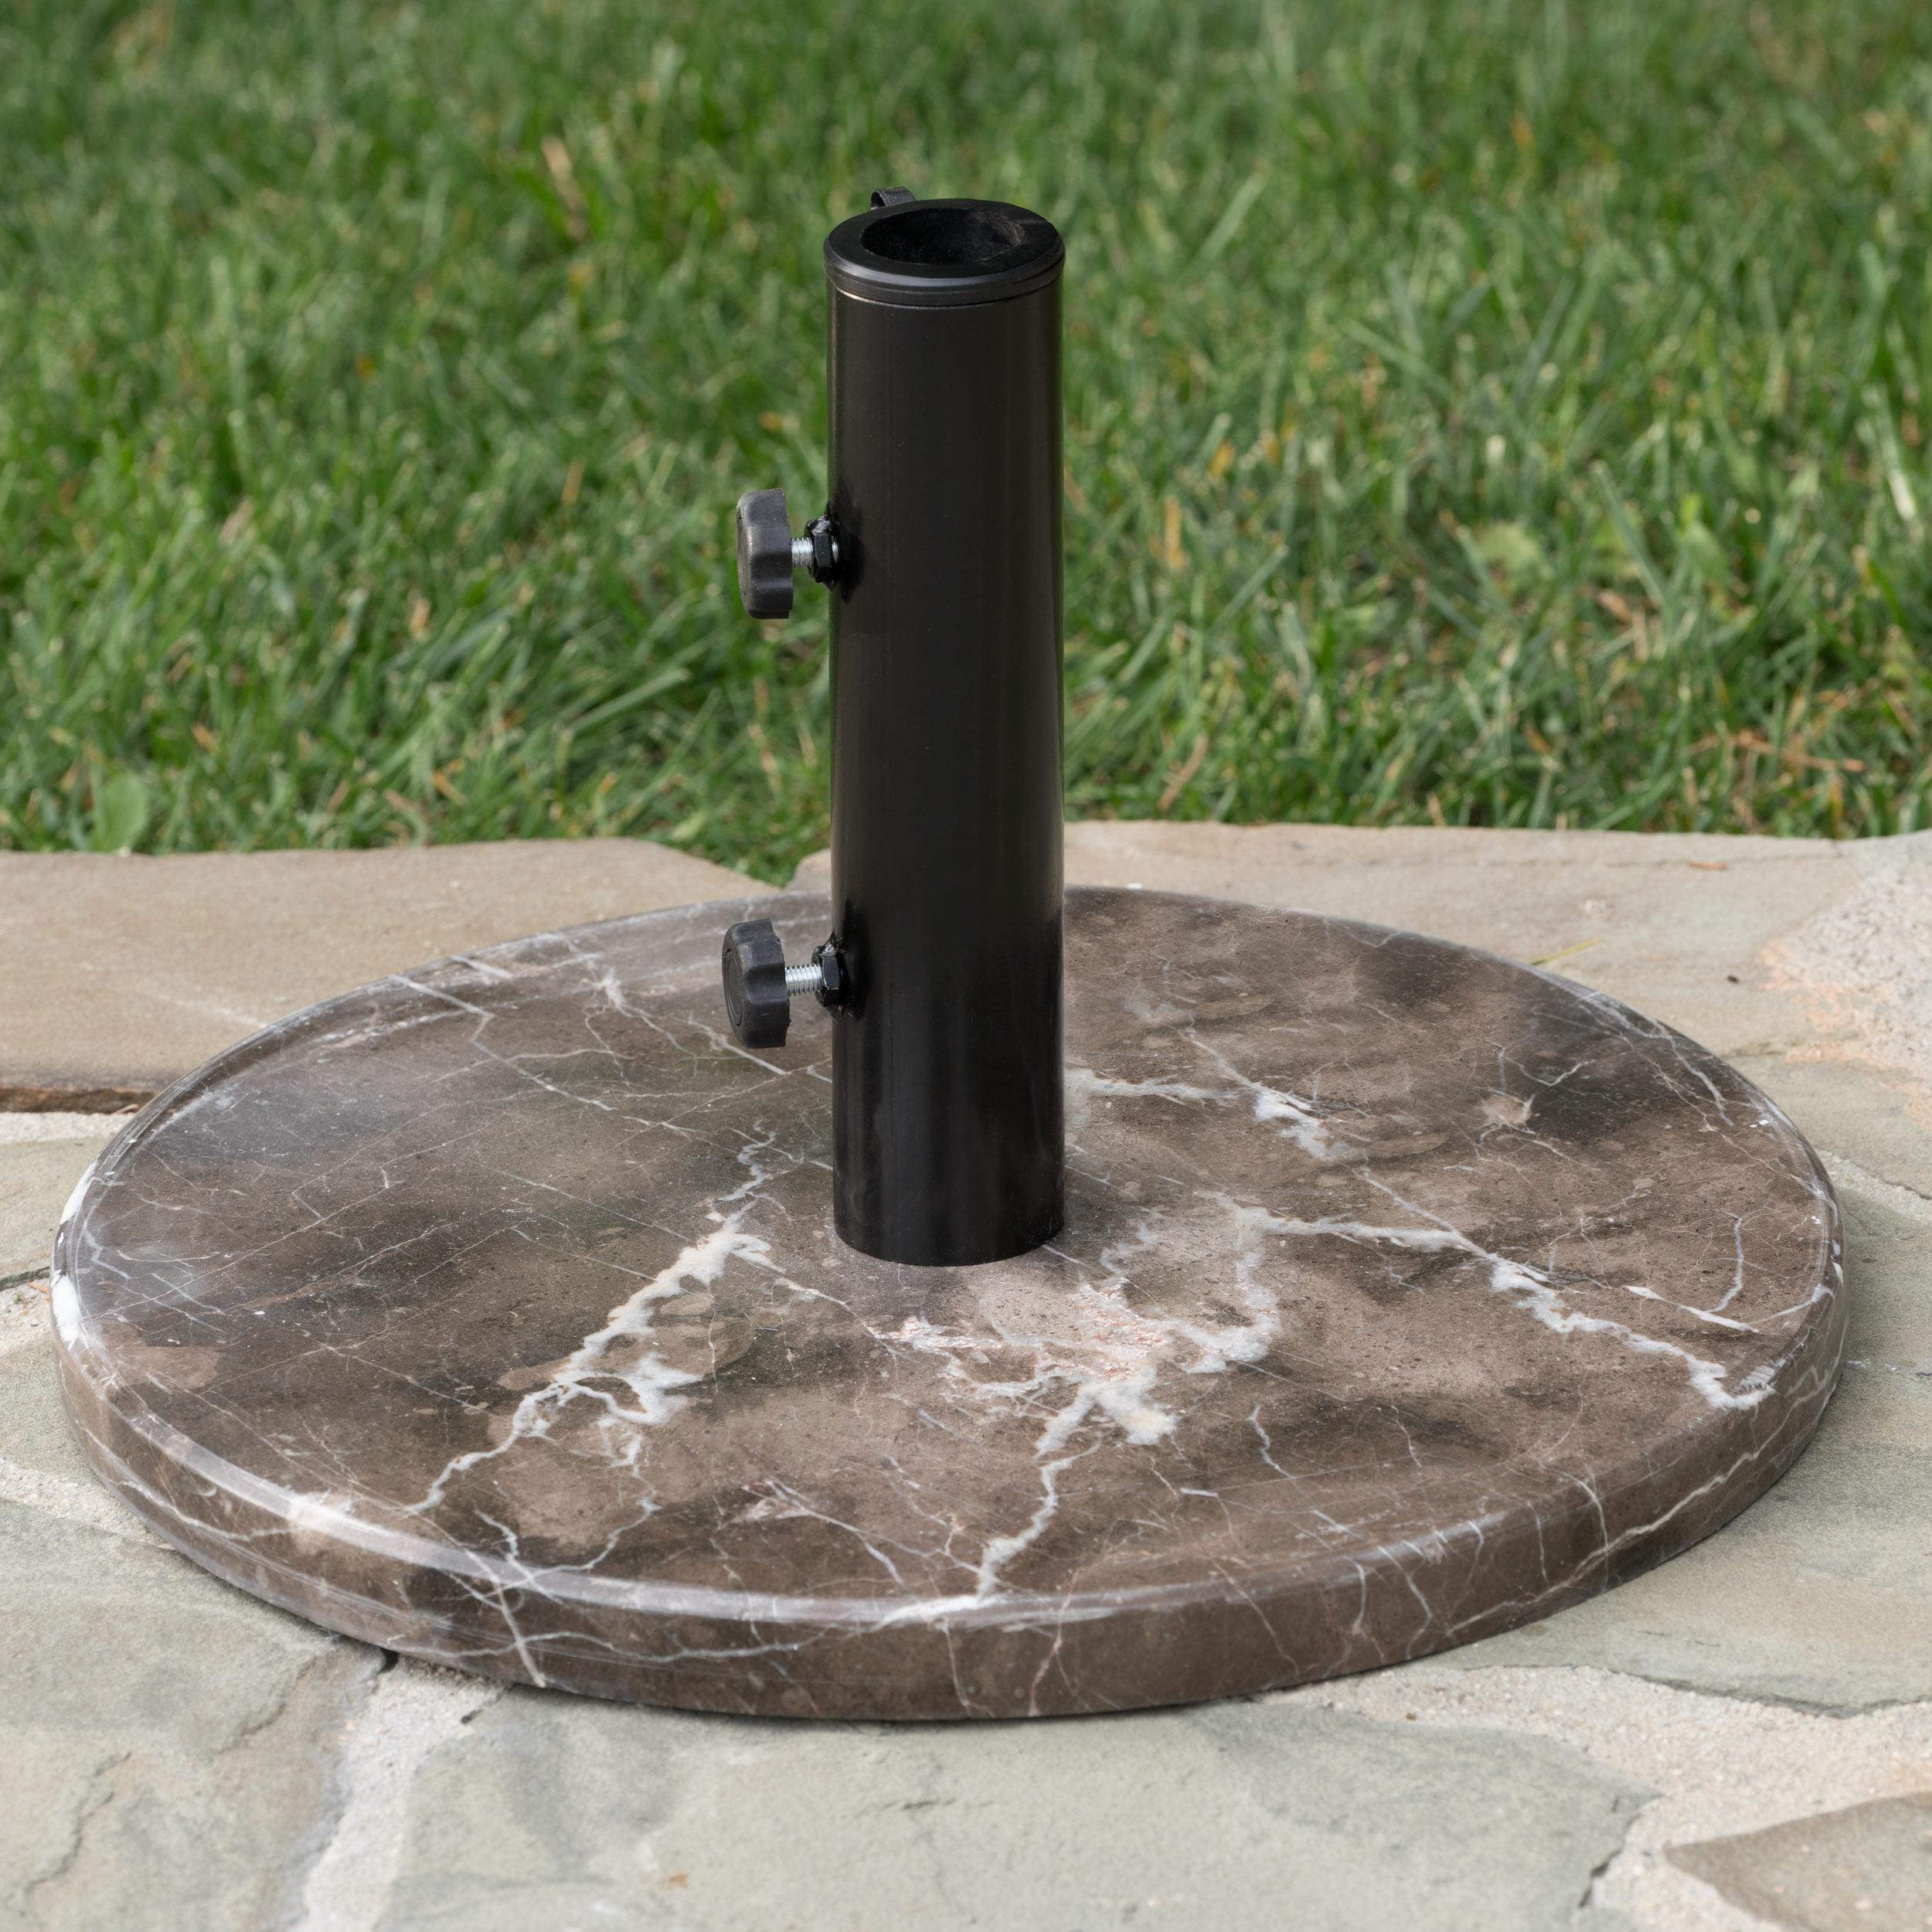 Marquise Outdoor Granite and Steel Unbrella Base, Coffee, Black